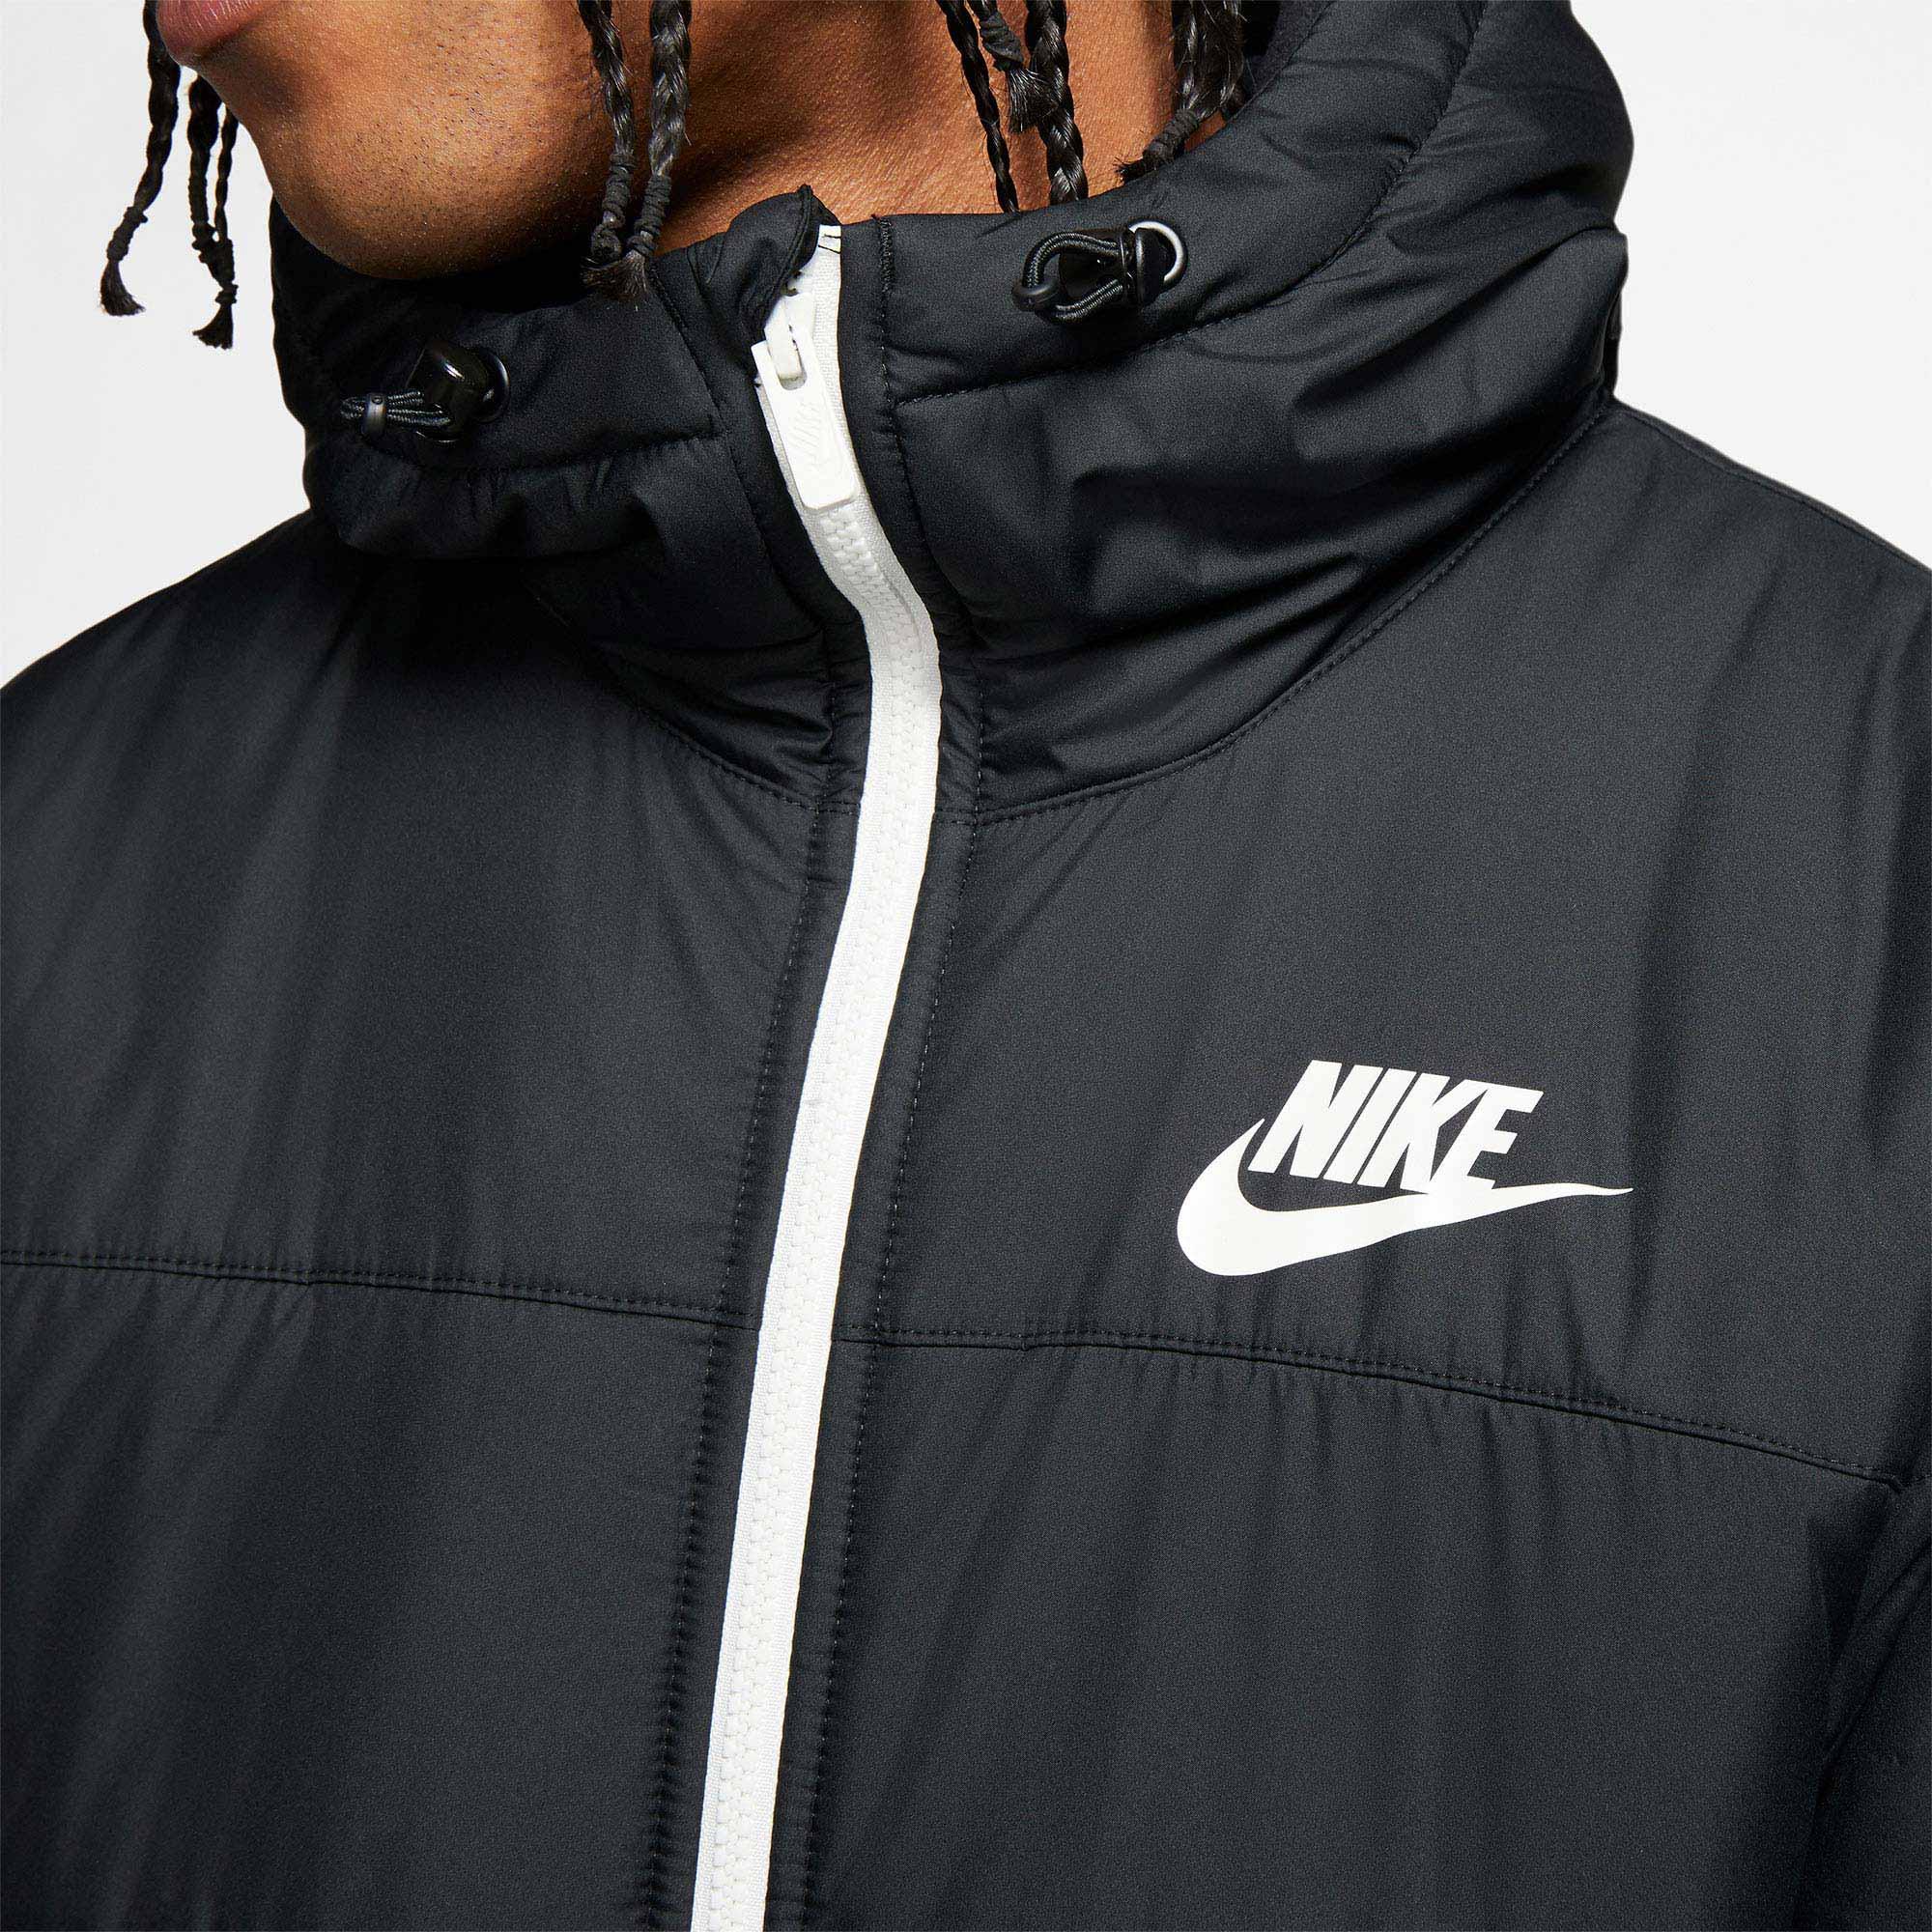 NIKE耐克外套男装2019冬新款连帽棉衣防风保暖运动棉服BV4684-010高清大图